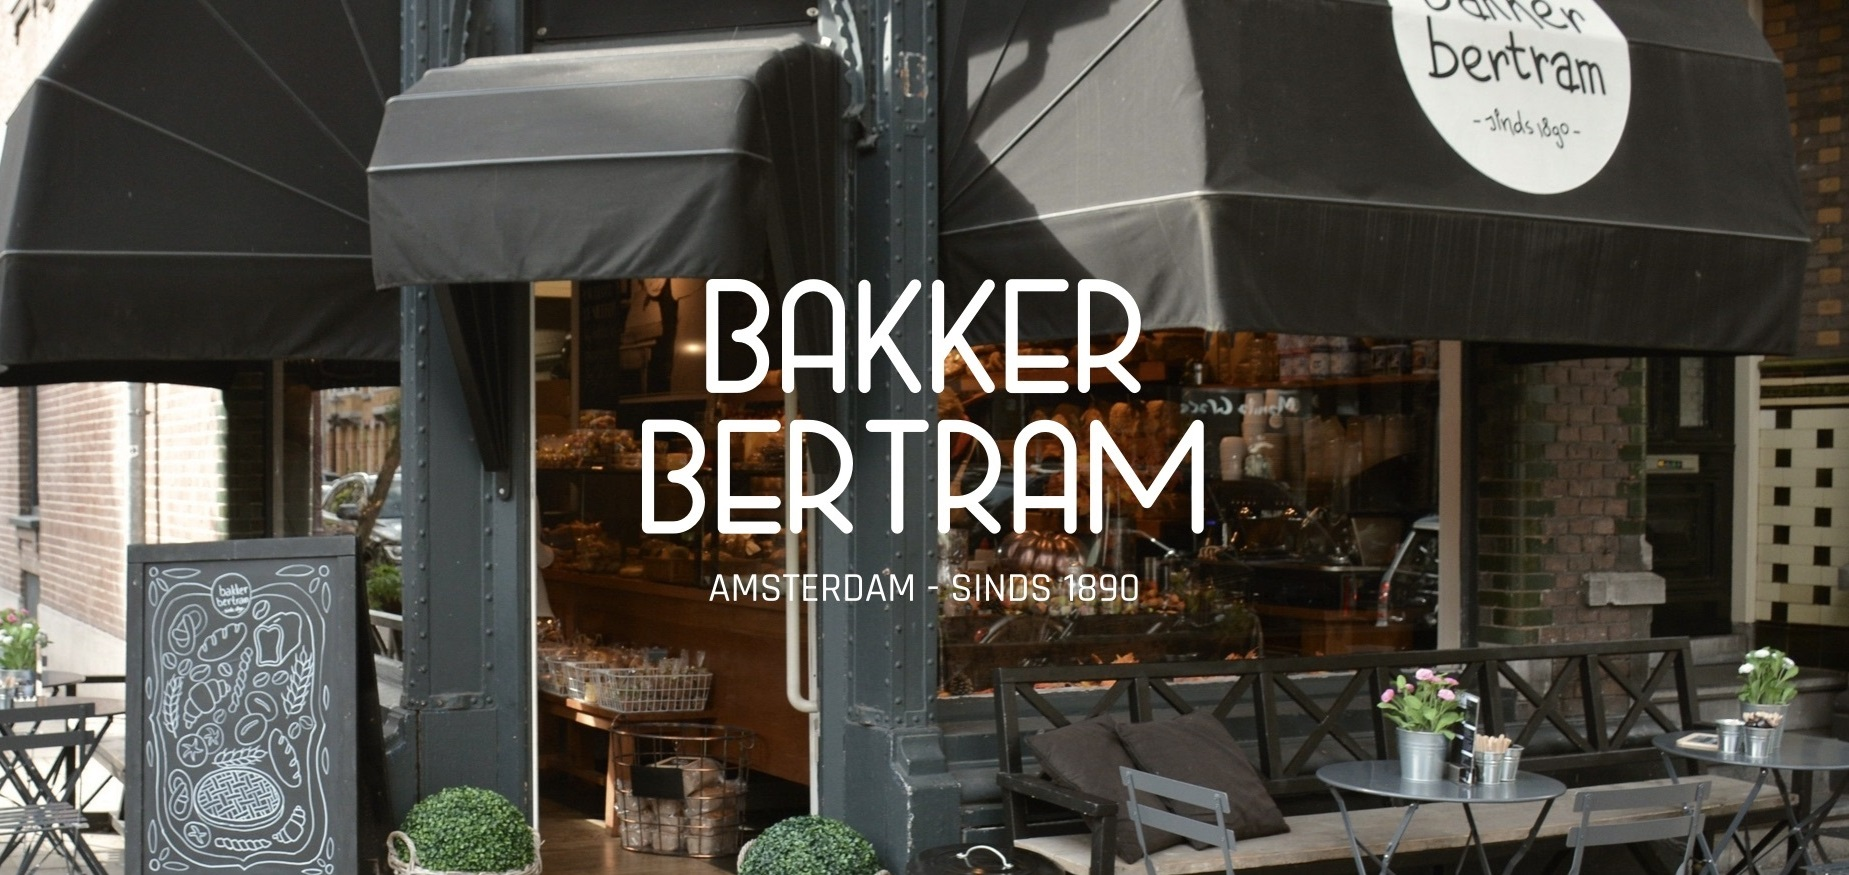 bakkerbertram-amsterdam-1